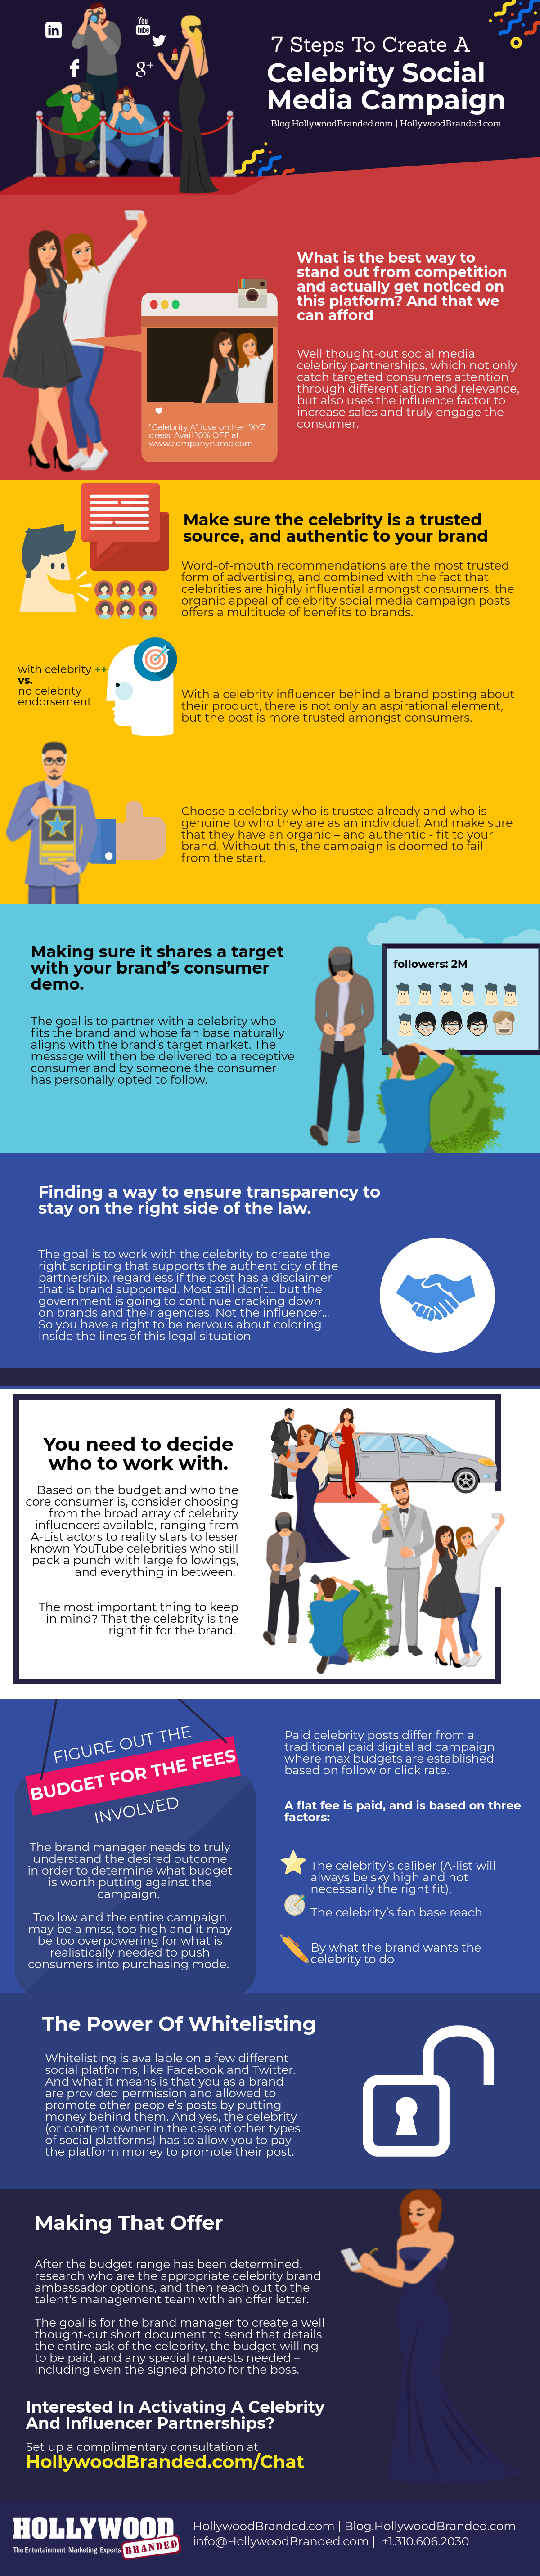 7 Steps To Create A Celebrity Social Media Campaign